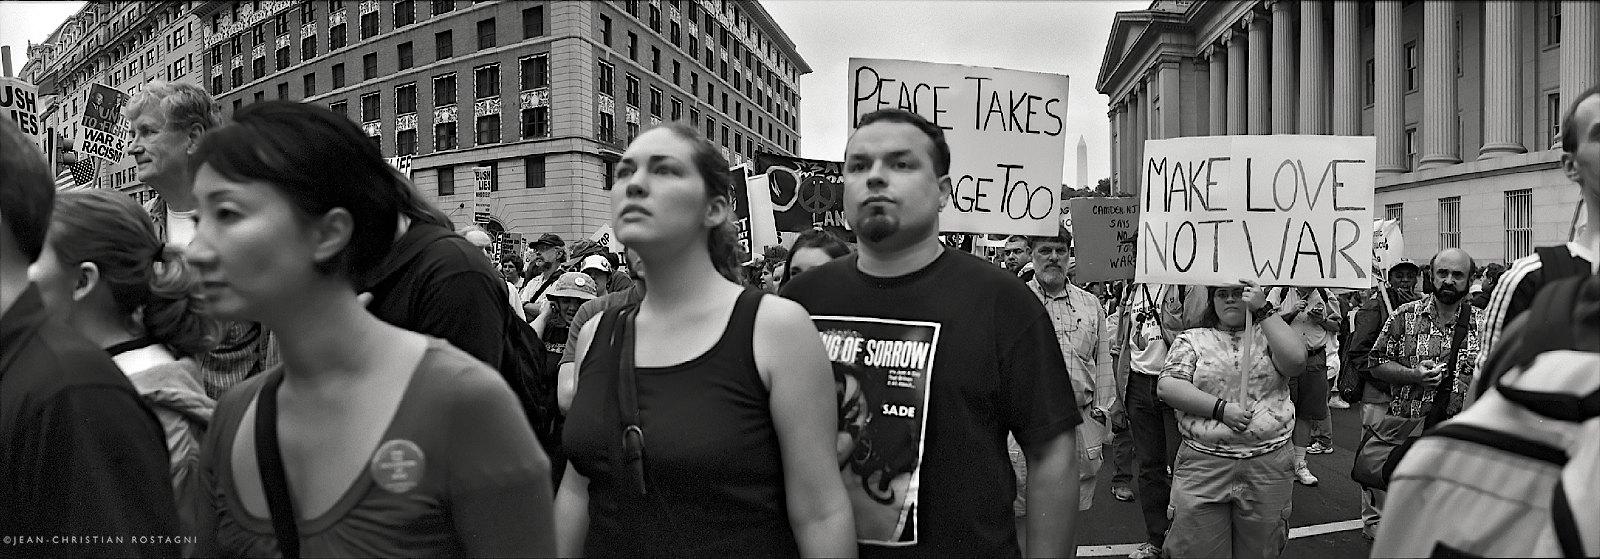 Make Love not War, protest